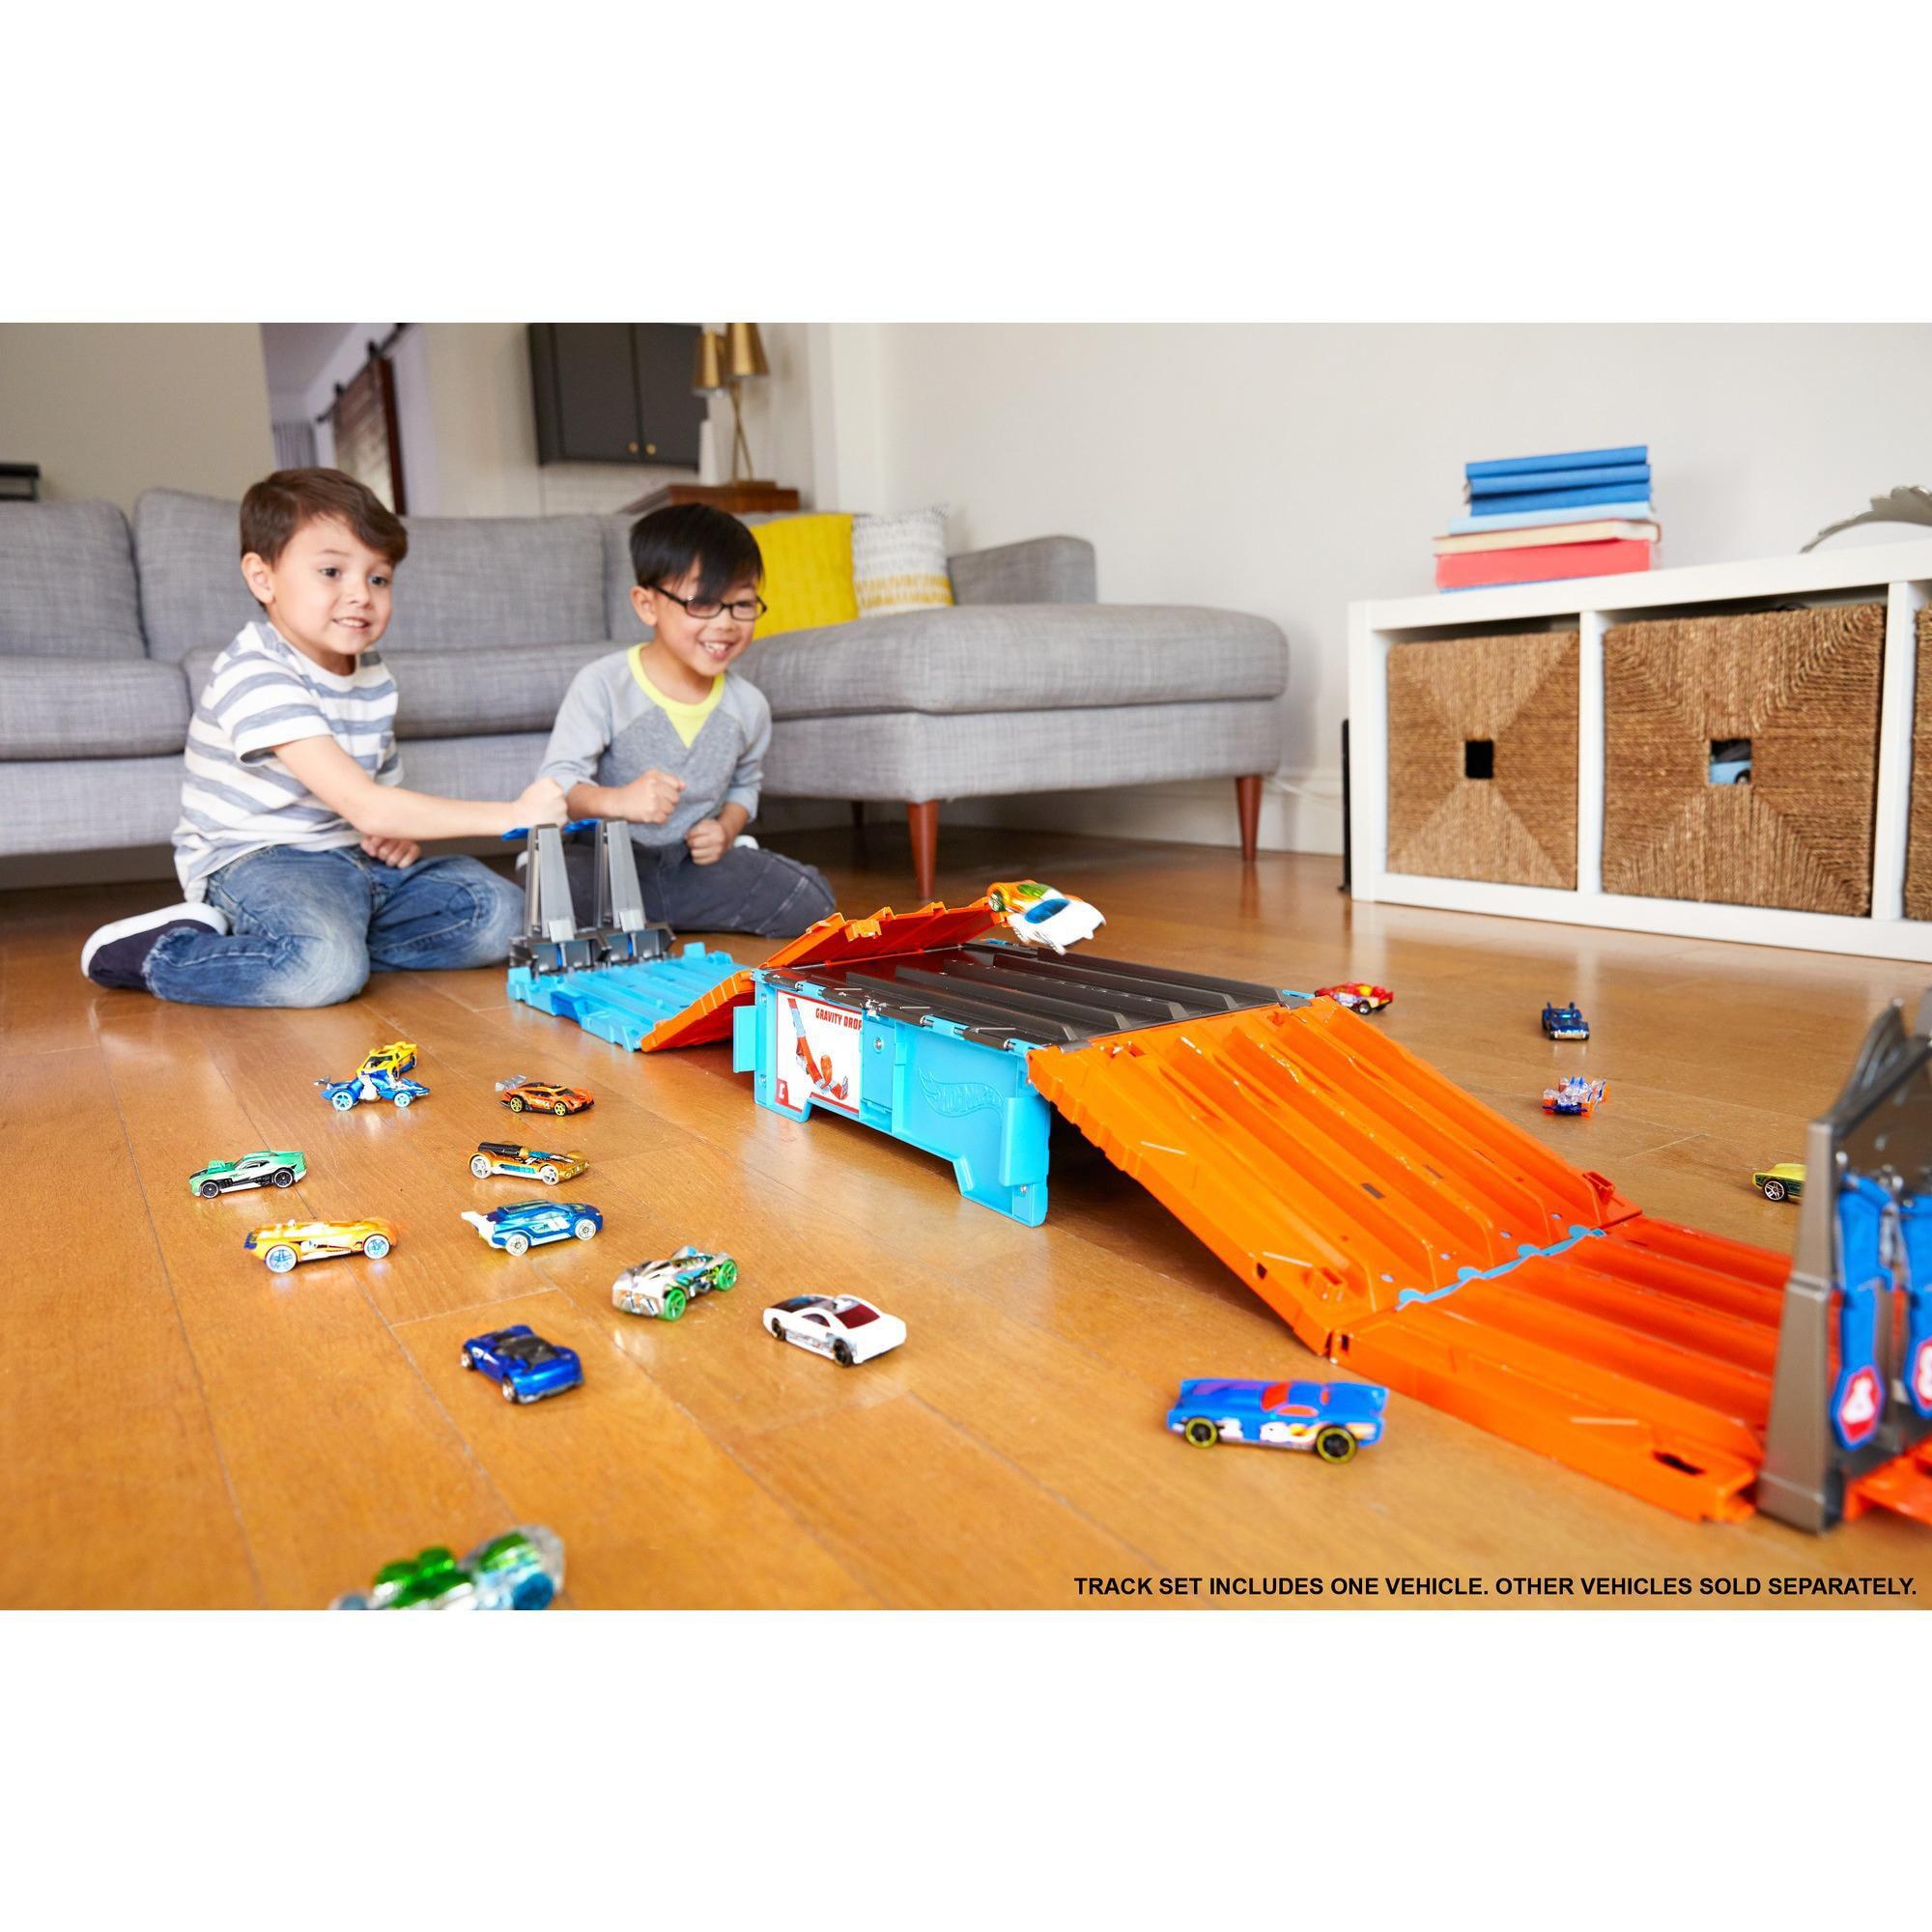 HOT WHEELS TRACK Builder System Race Crate Stunt Set Kids Racetracks Playset